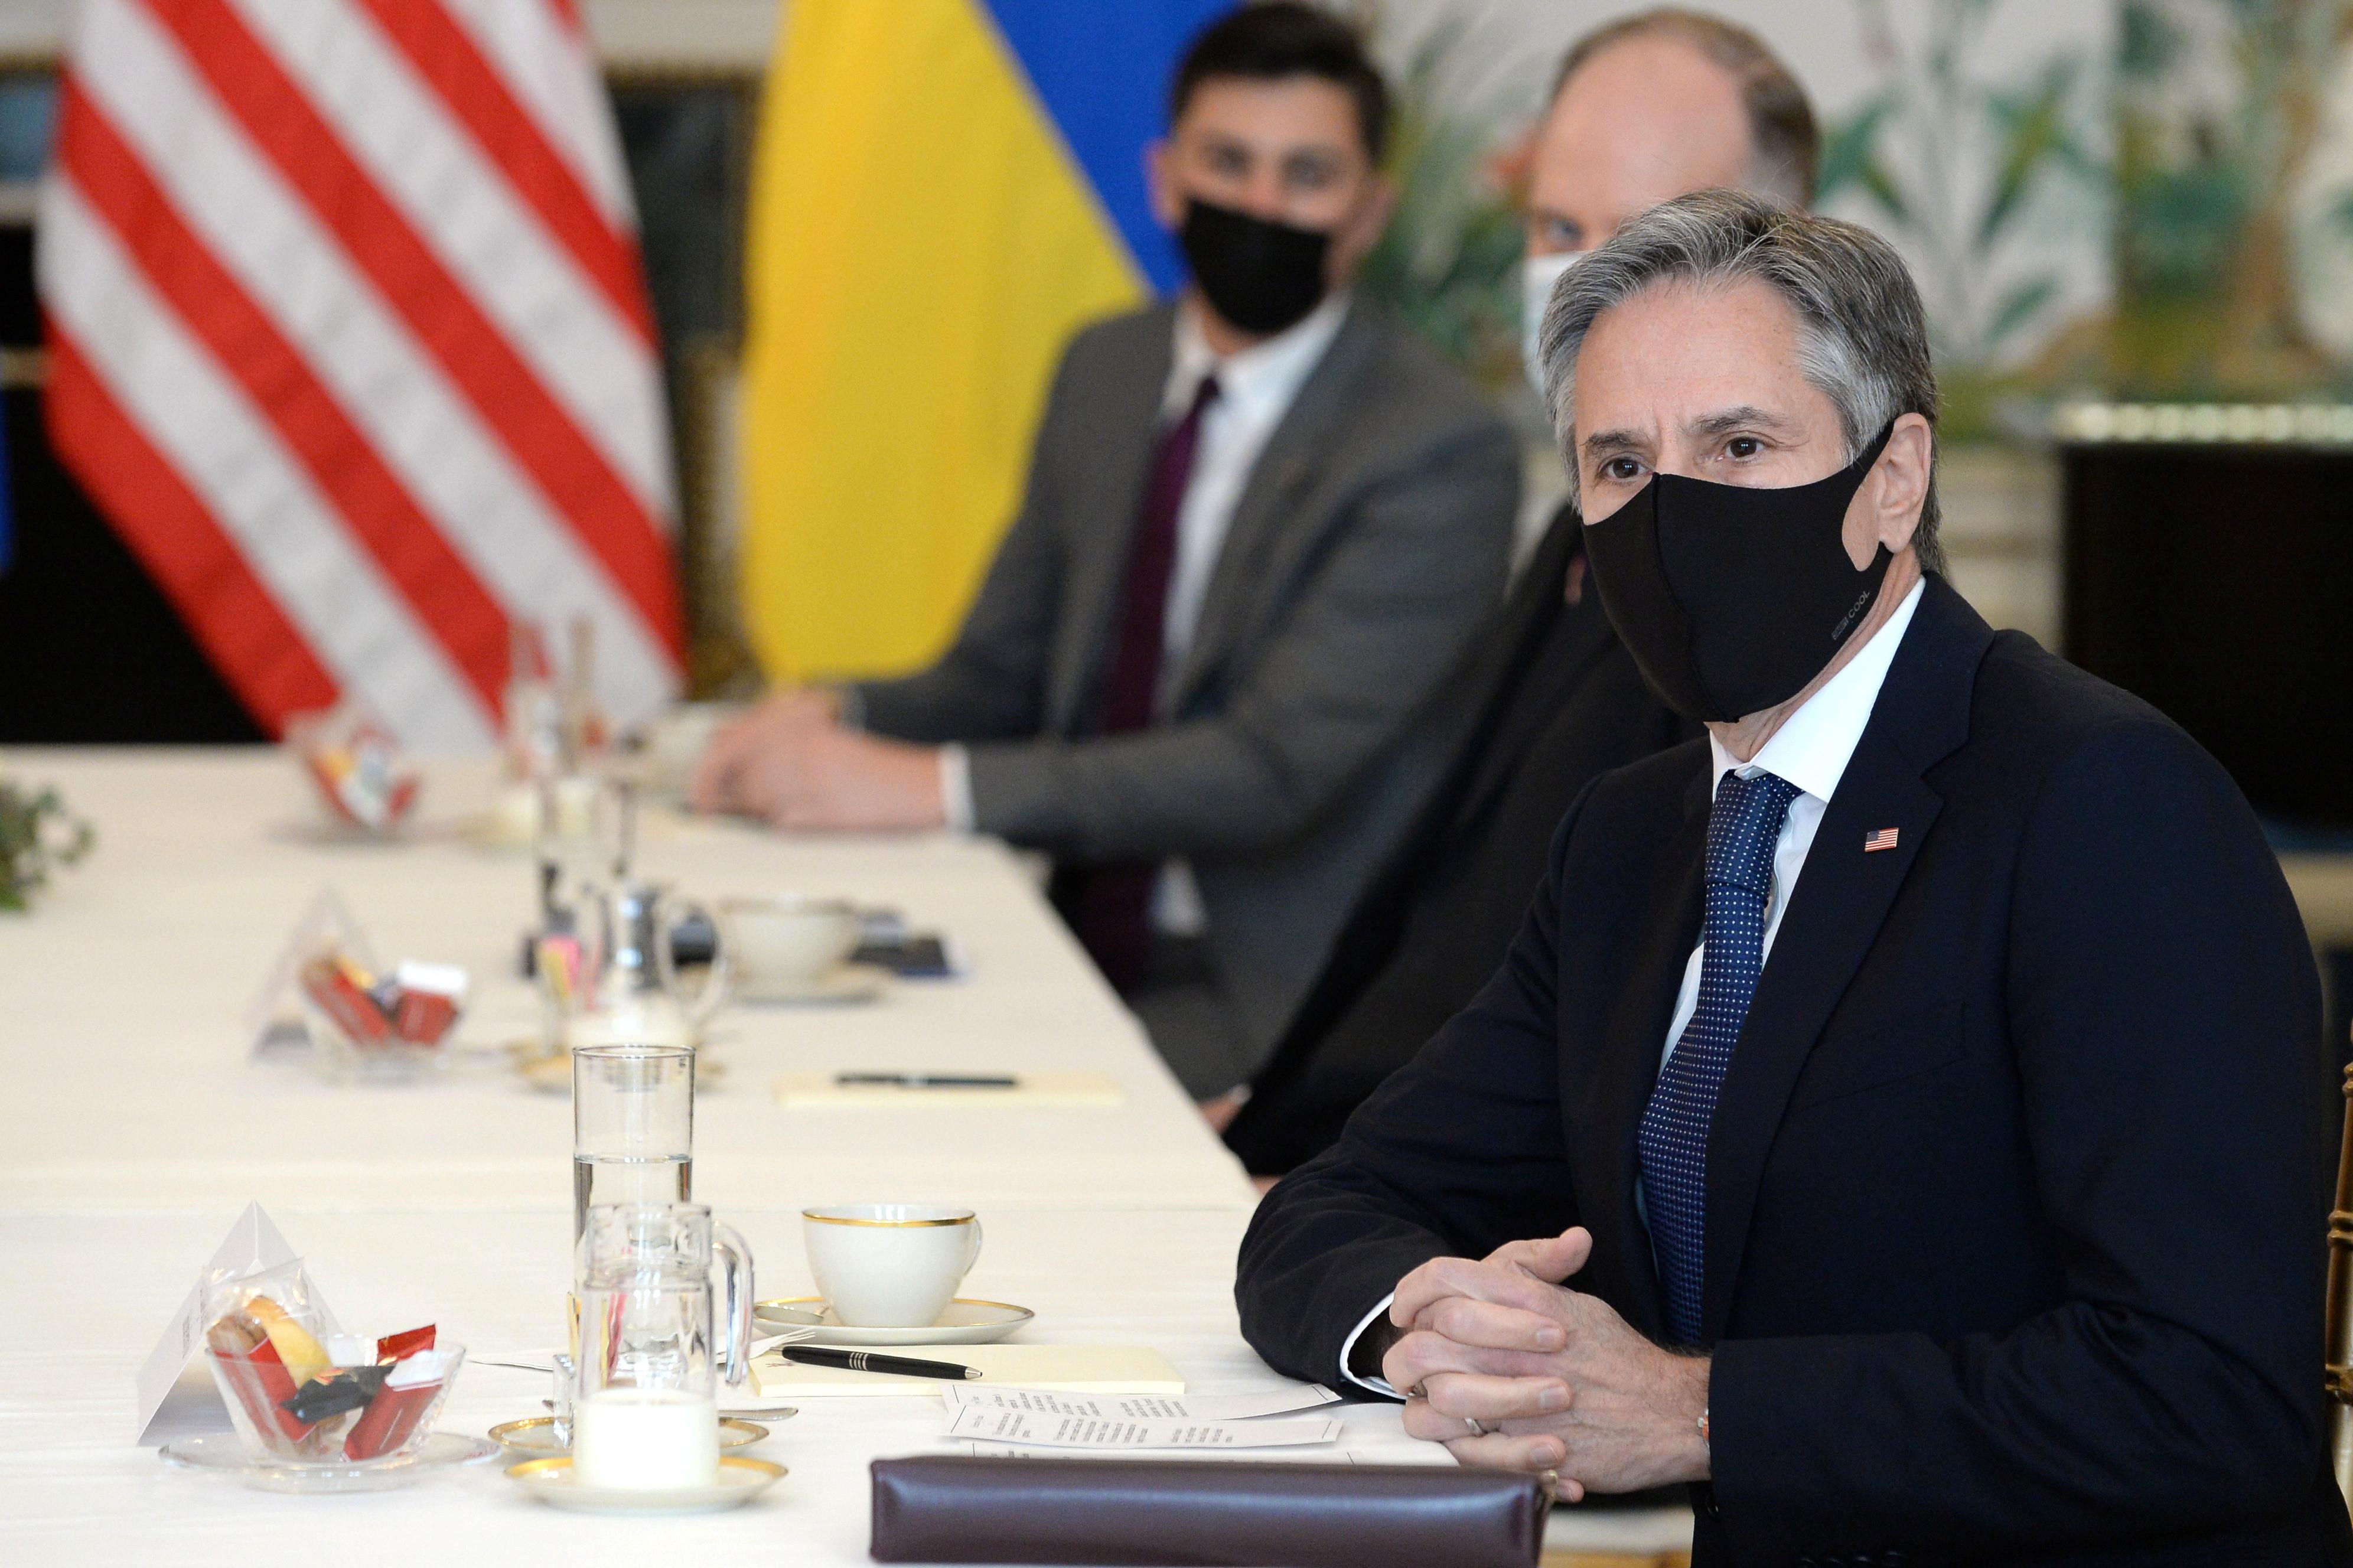 U.S. Secretary of State Antony Blinken meets with Ukrainian Foreign Minister Dmytro Kuleba (not seen) in Brussels, Belgium April 13, 2021. REUTERS/Johanna Geron/Pool